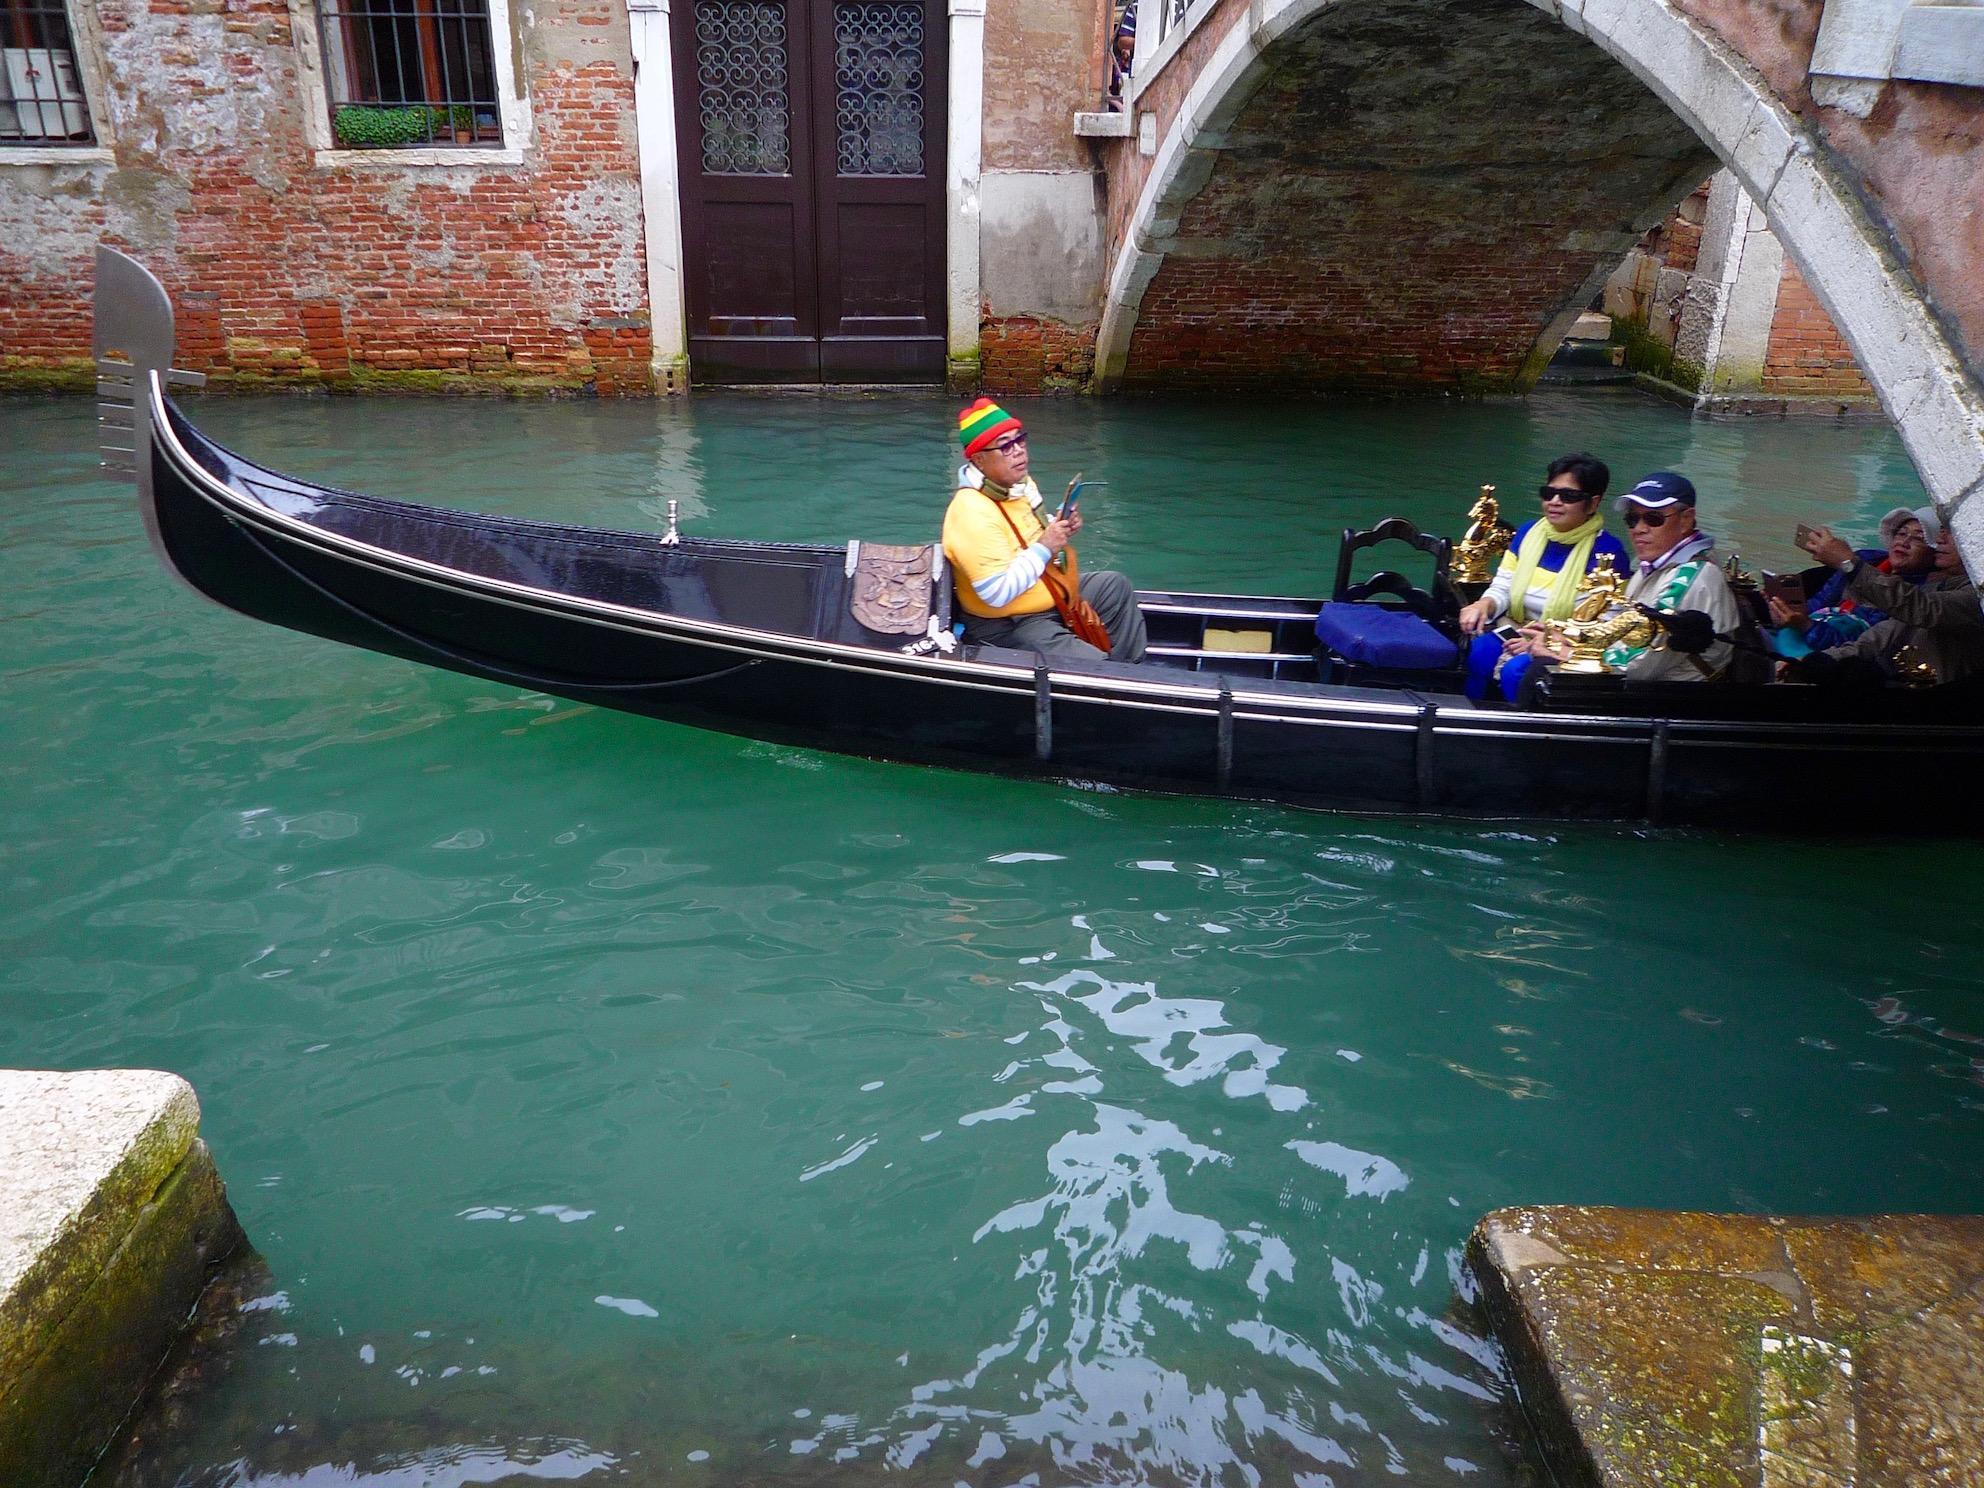 fig. c: gondola scene